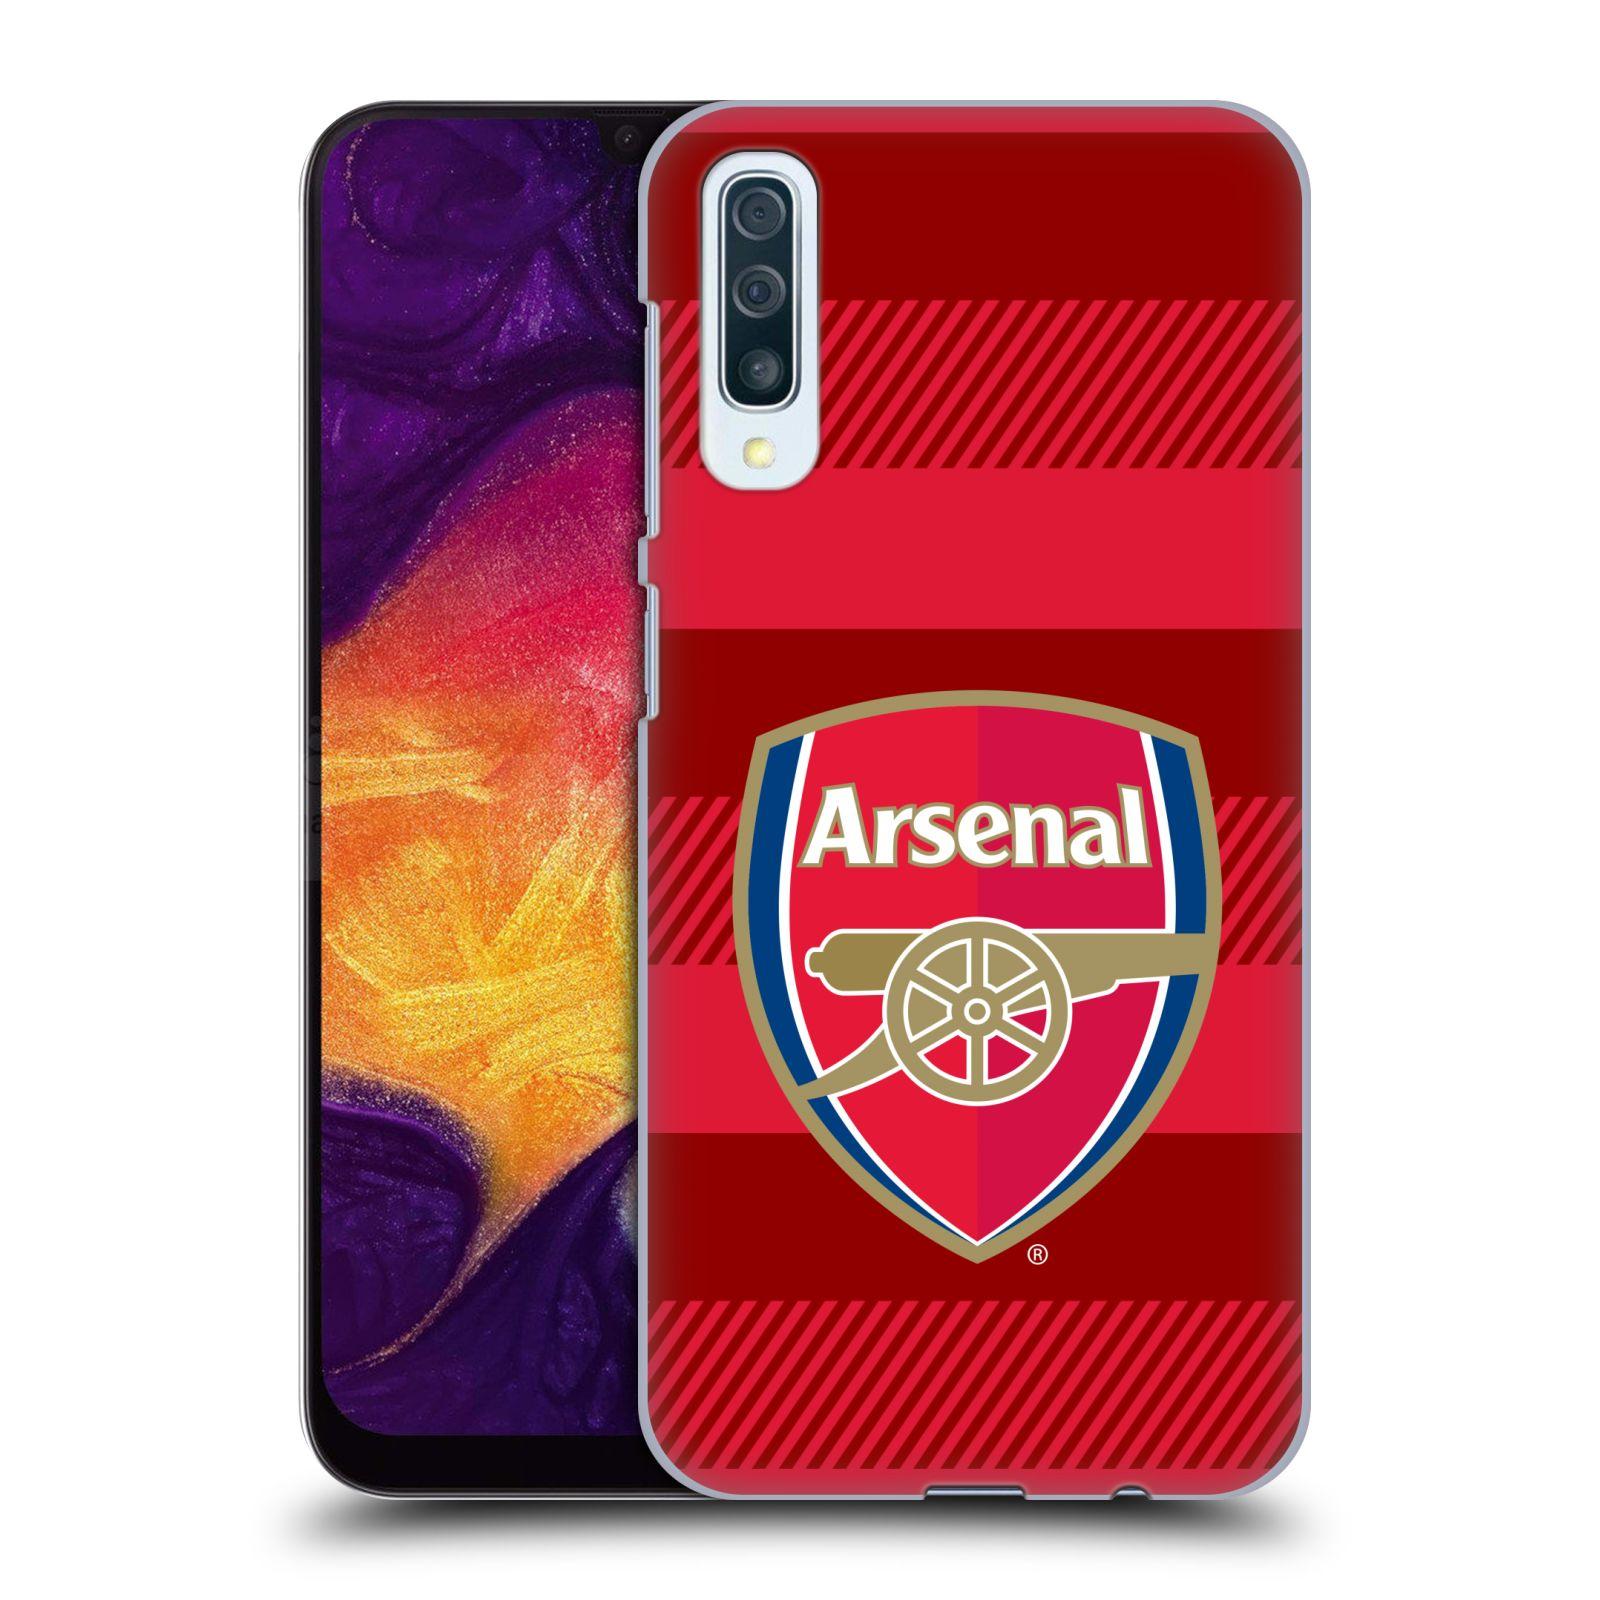 Plastové pouzdro na mobil Samsung Galaxy A50 - Head Case - Arsenal FC - Logo s pruhy